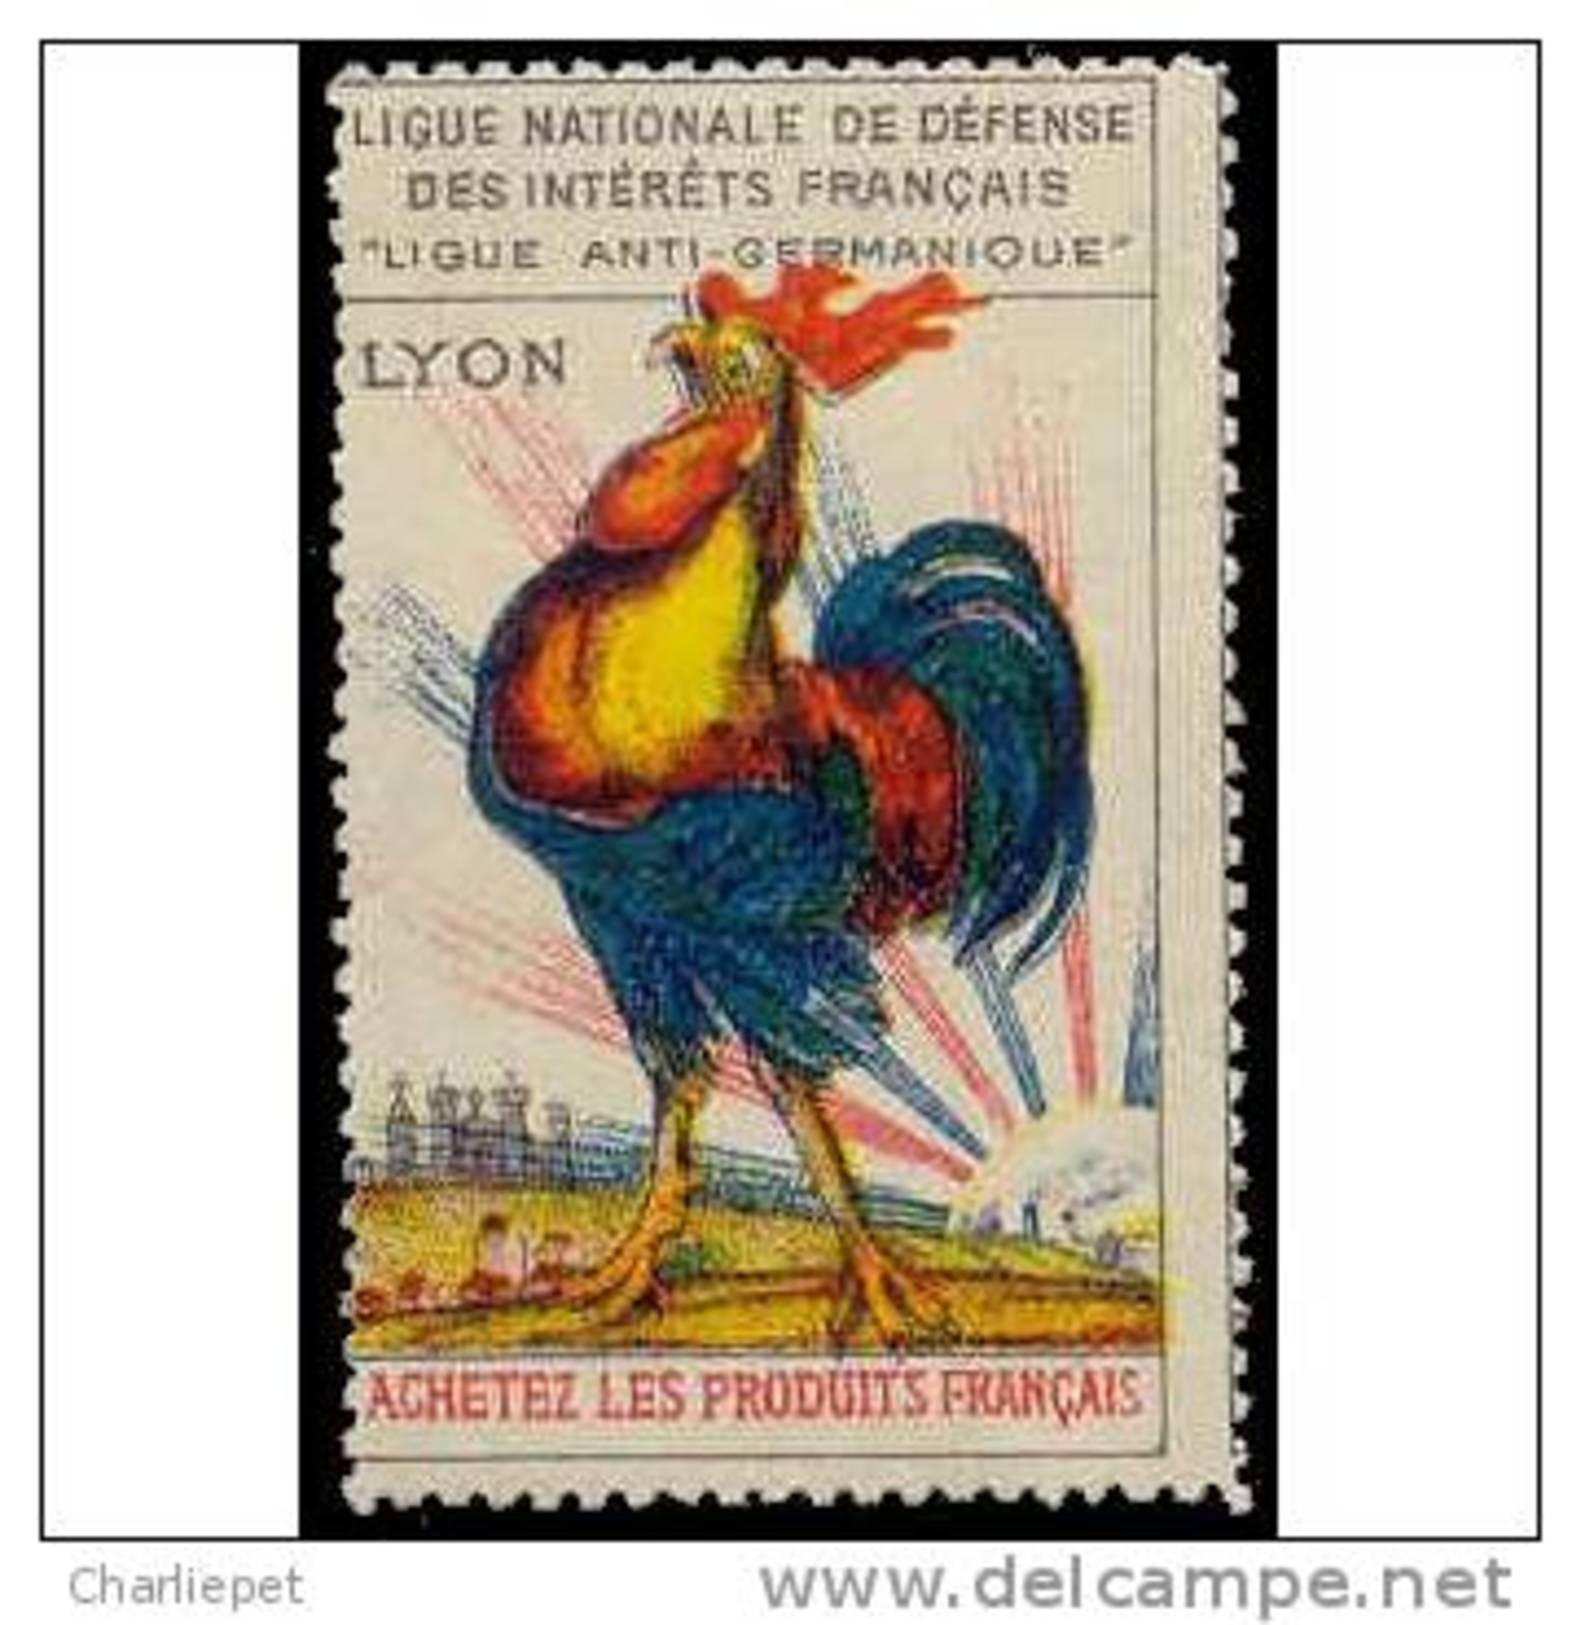 France WWI Women's Crusade Vignette Lyon Rooster Cinderella Poster Stamp - Unclassified